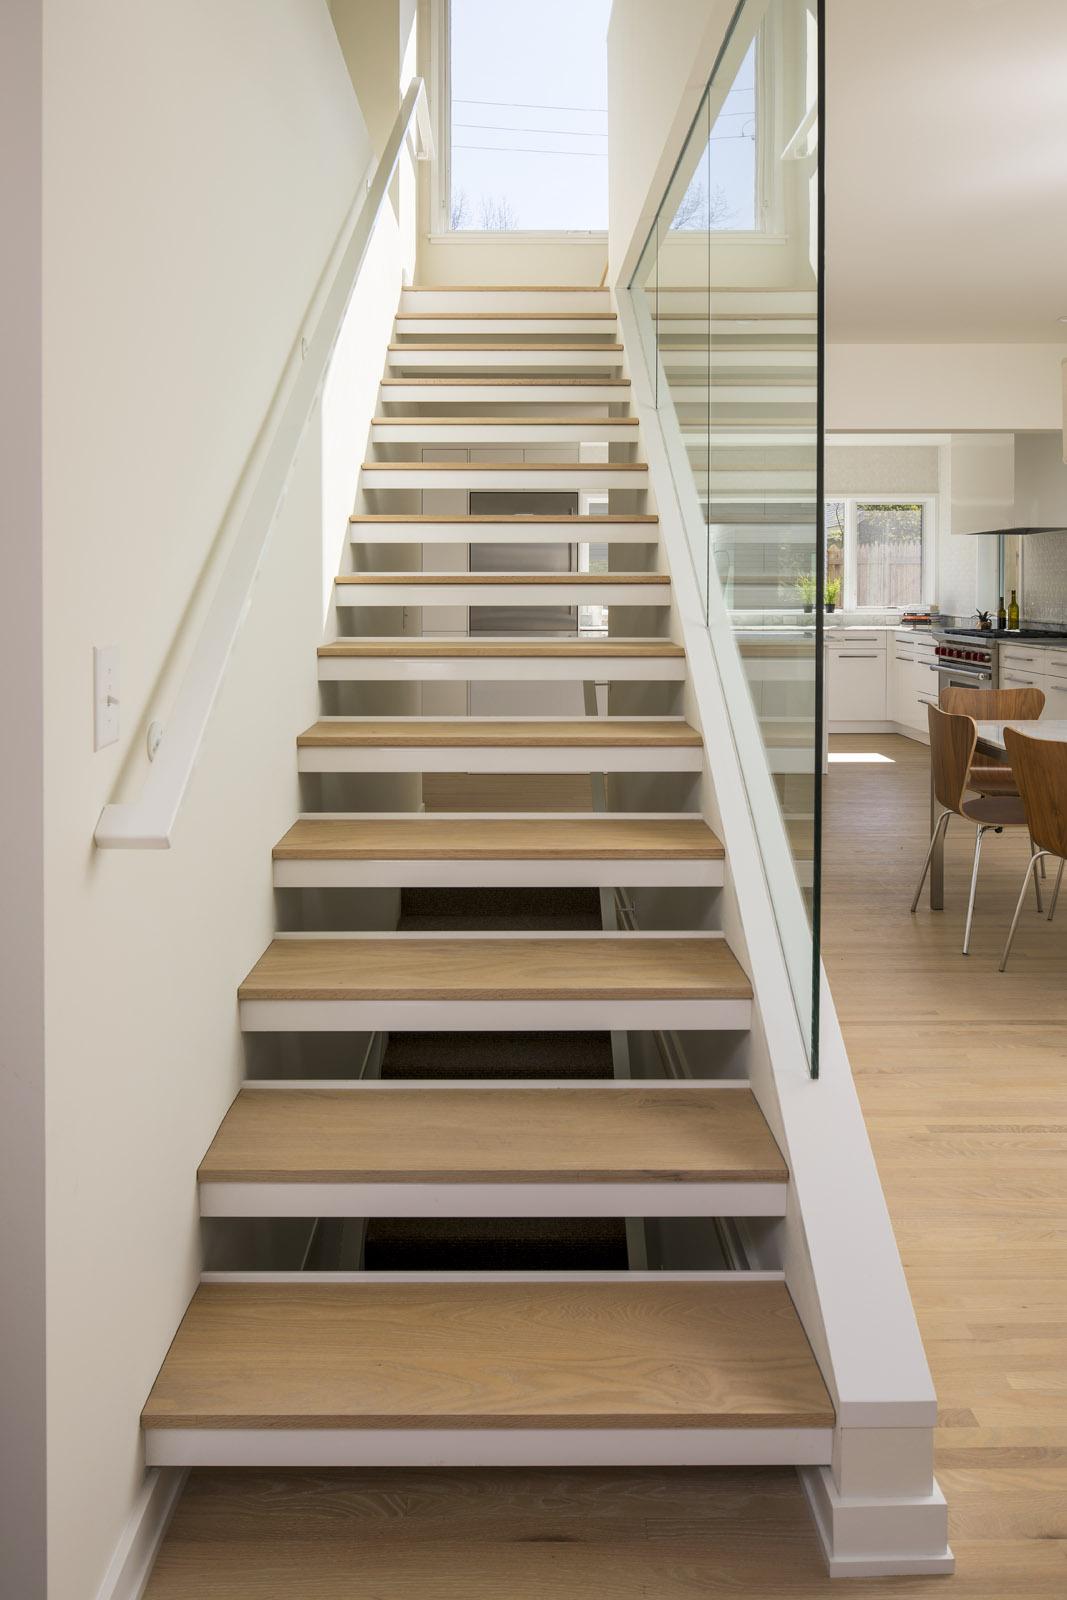 Custom open wood stair tread detail in modern home